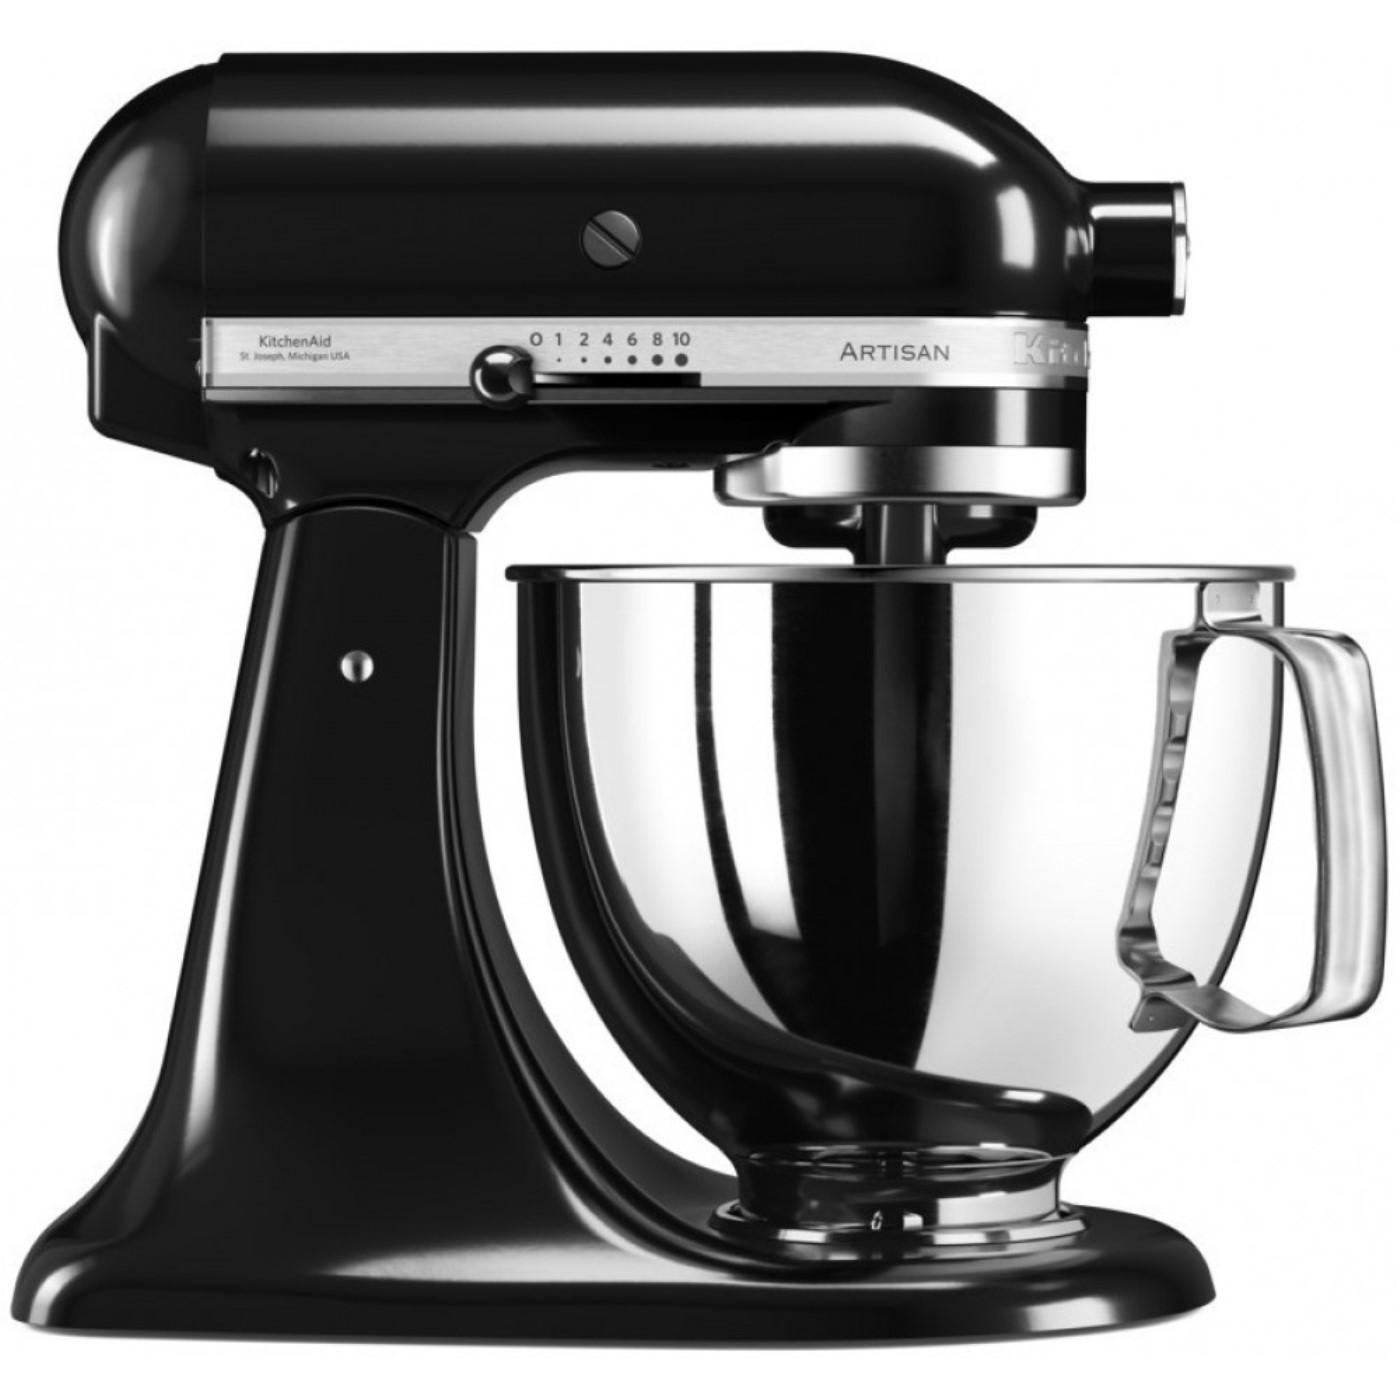 Онлайн каталог PROMENU: Миксер планетарный KitchenAid Artisan, объем чаши 4,83 л, черный                  KitchenAid 5KSM125EOB